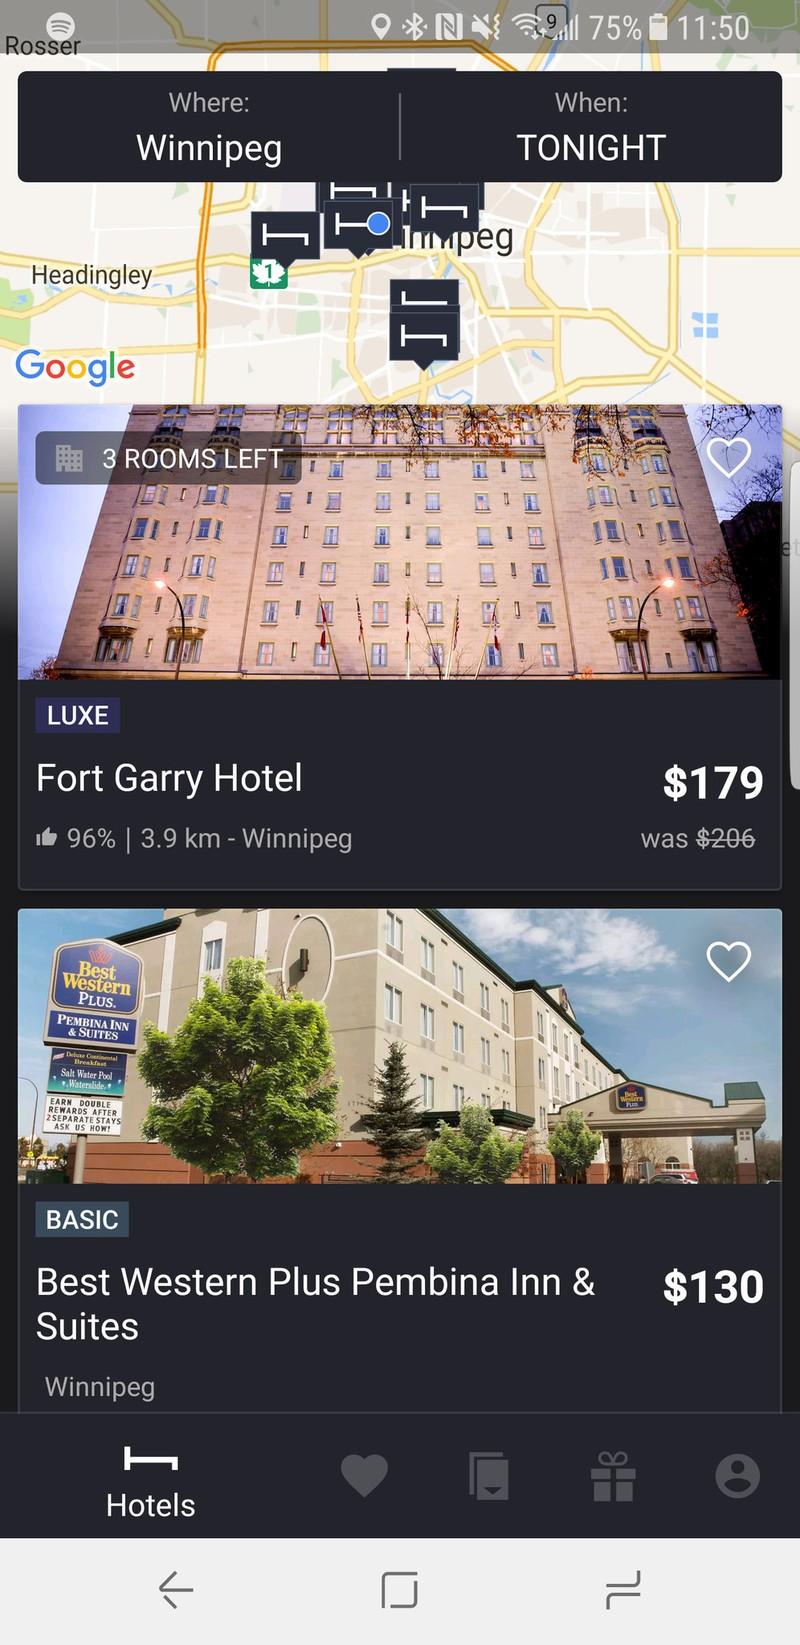 hoteltonight-screens-01.jpg?itok=Ppj_YA3